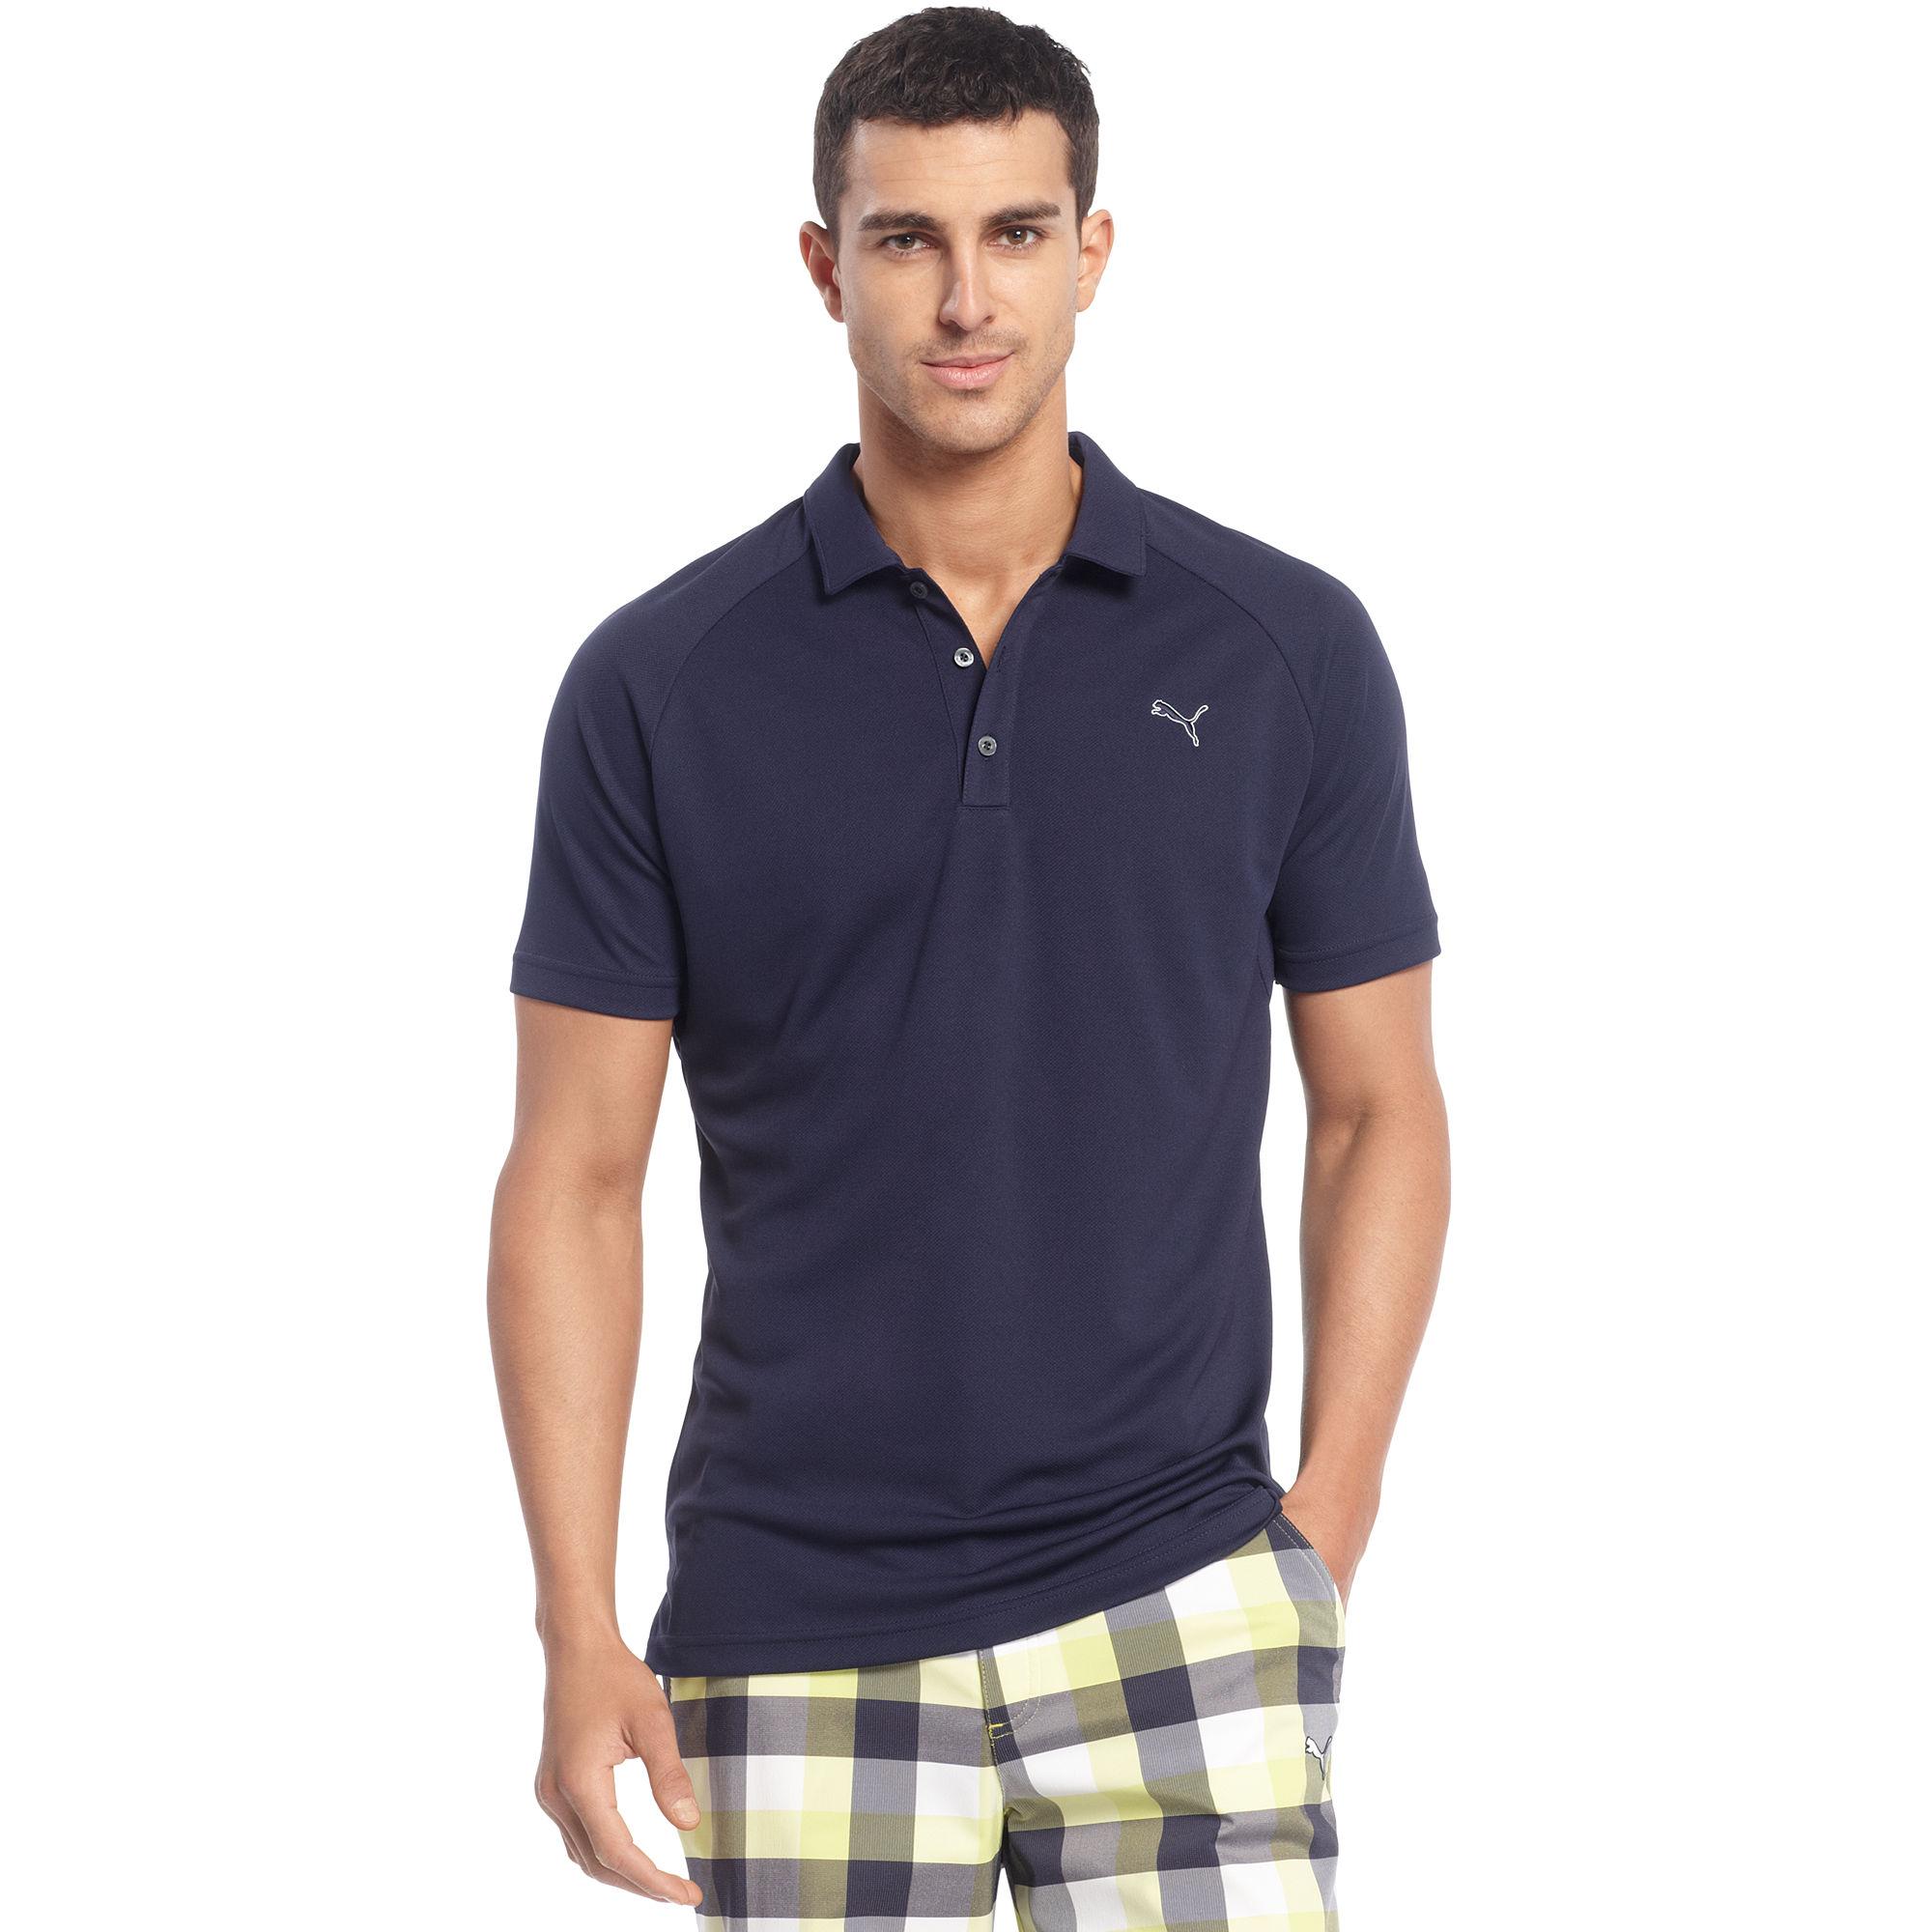 Puma Raglan Tech Golf Polo Shirt In Blue For Men White